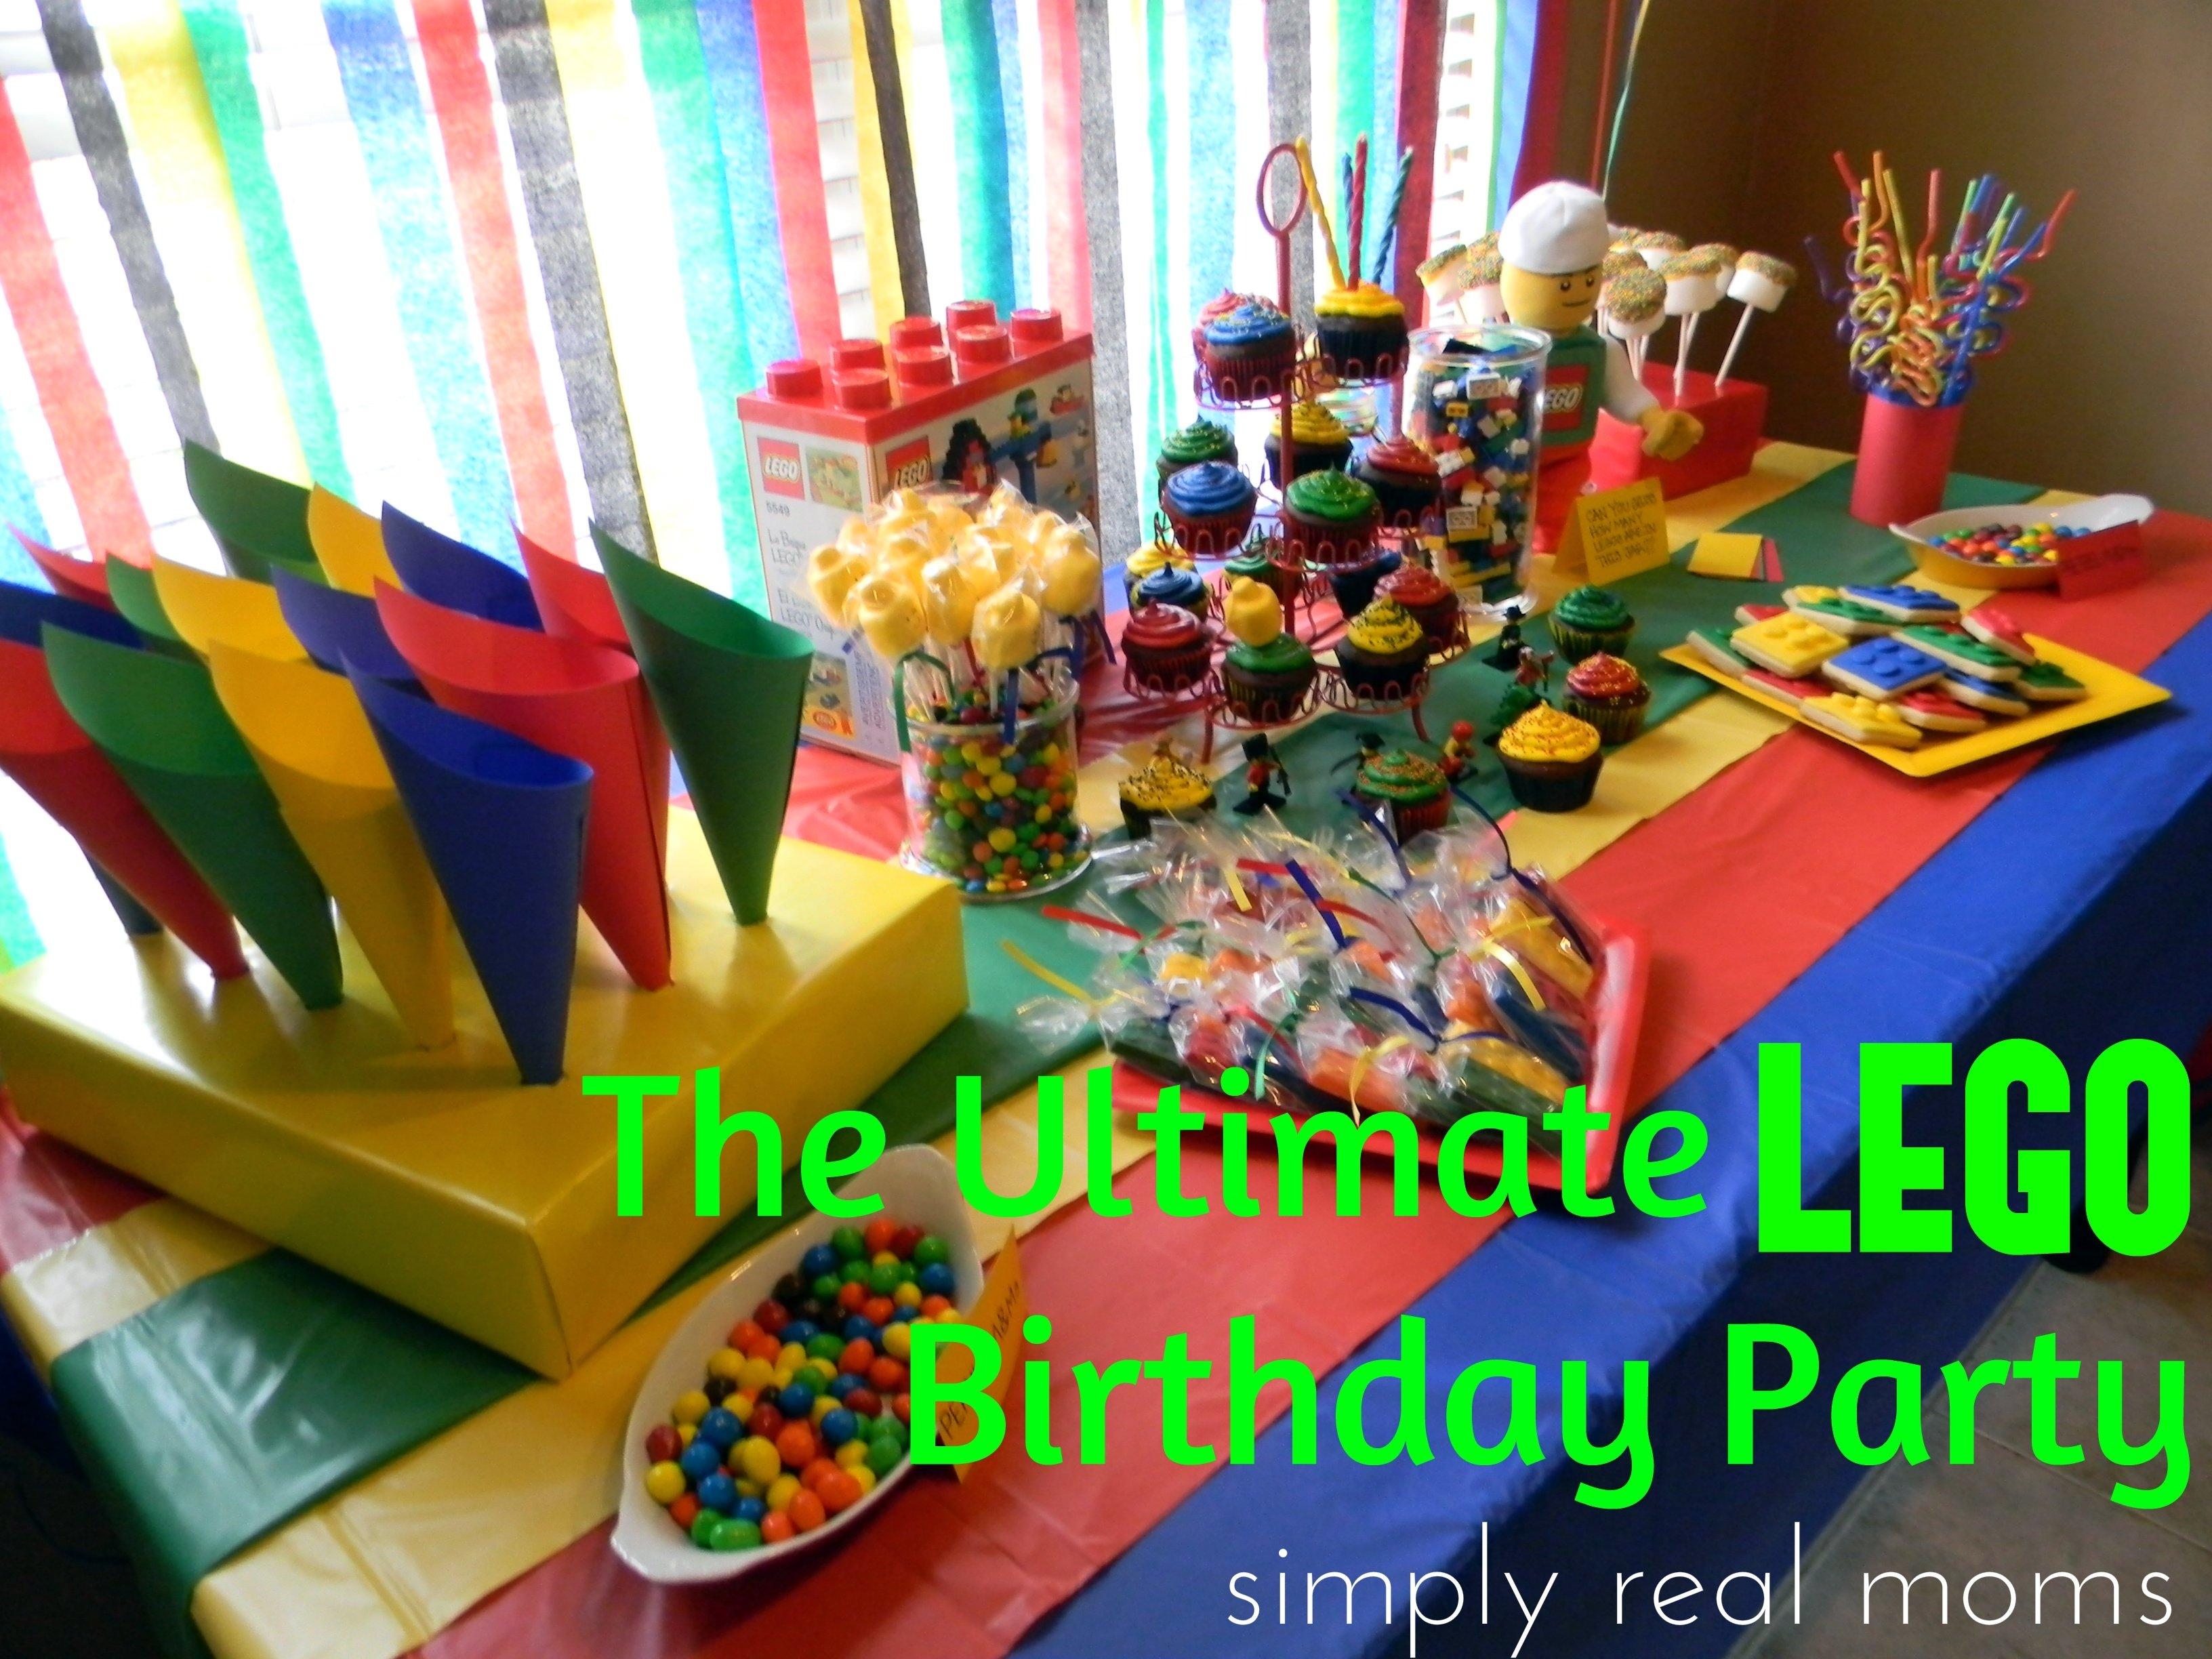 10 Nice Lego Birthday Party Food Ideas the ultimate lego birthday party tyreses room ideas pinterest 2020